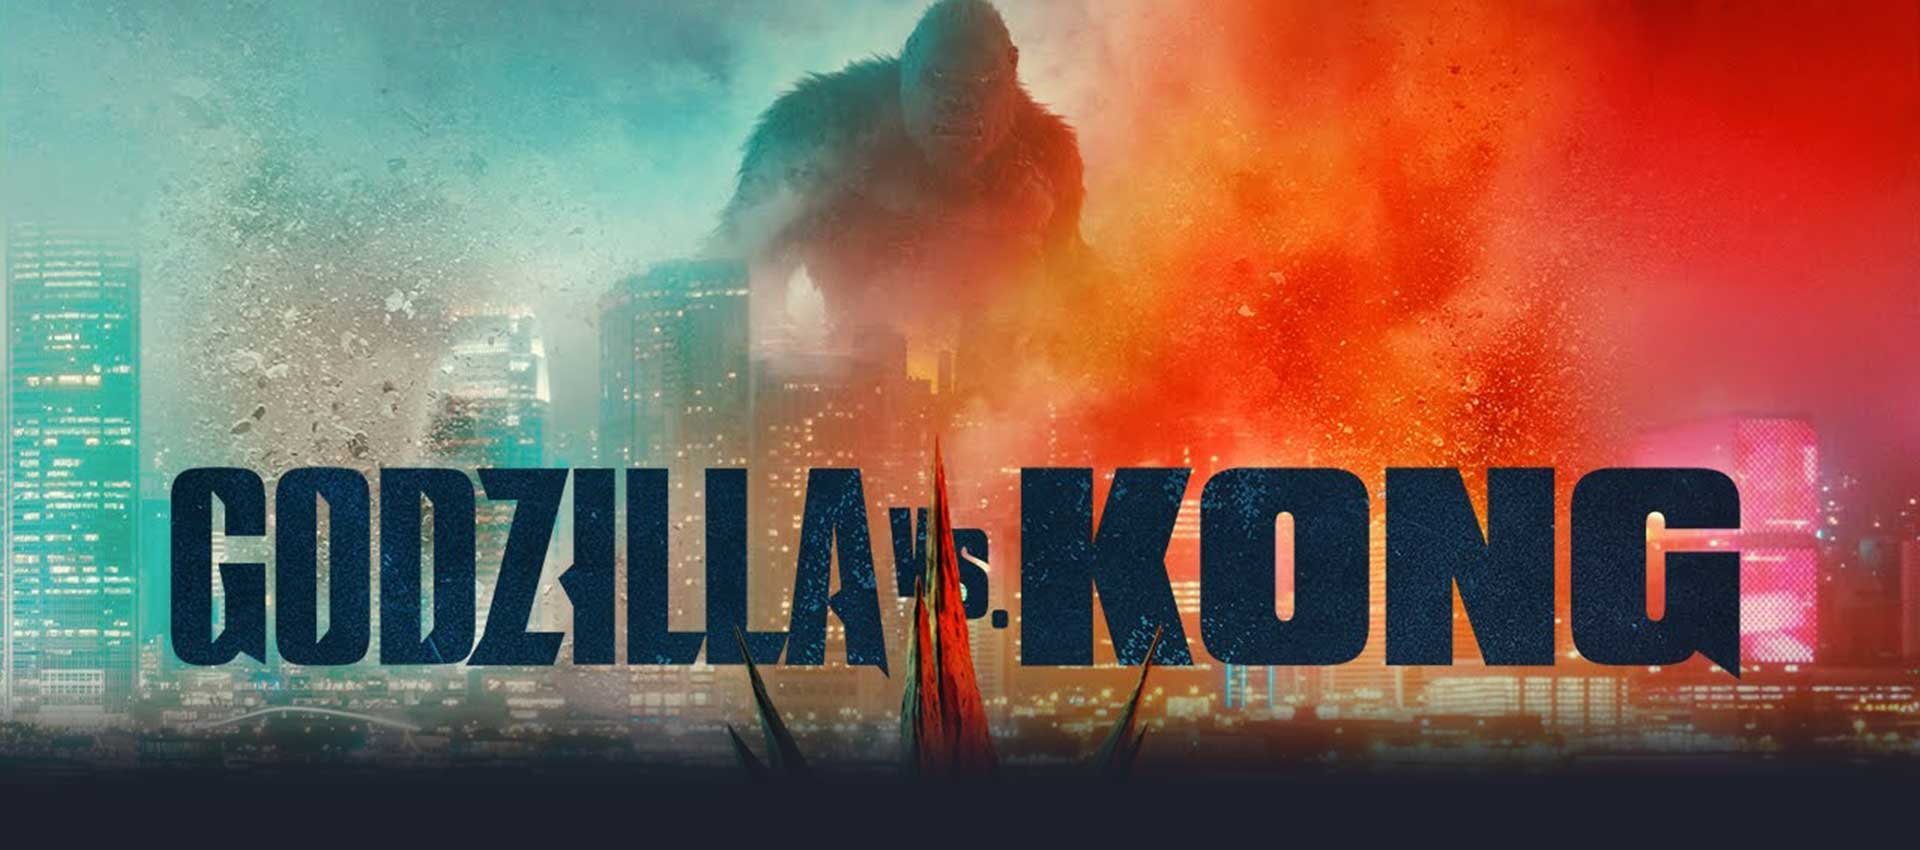 Godzilla vs Kong film izle türkçe izle hd izle